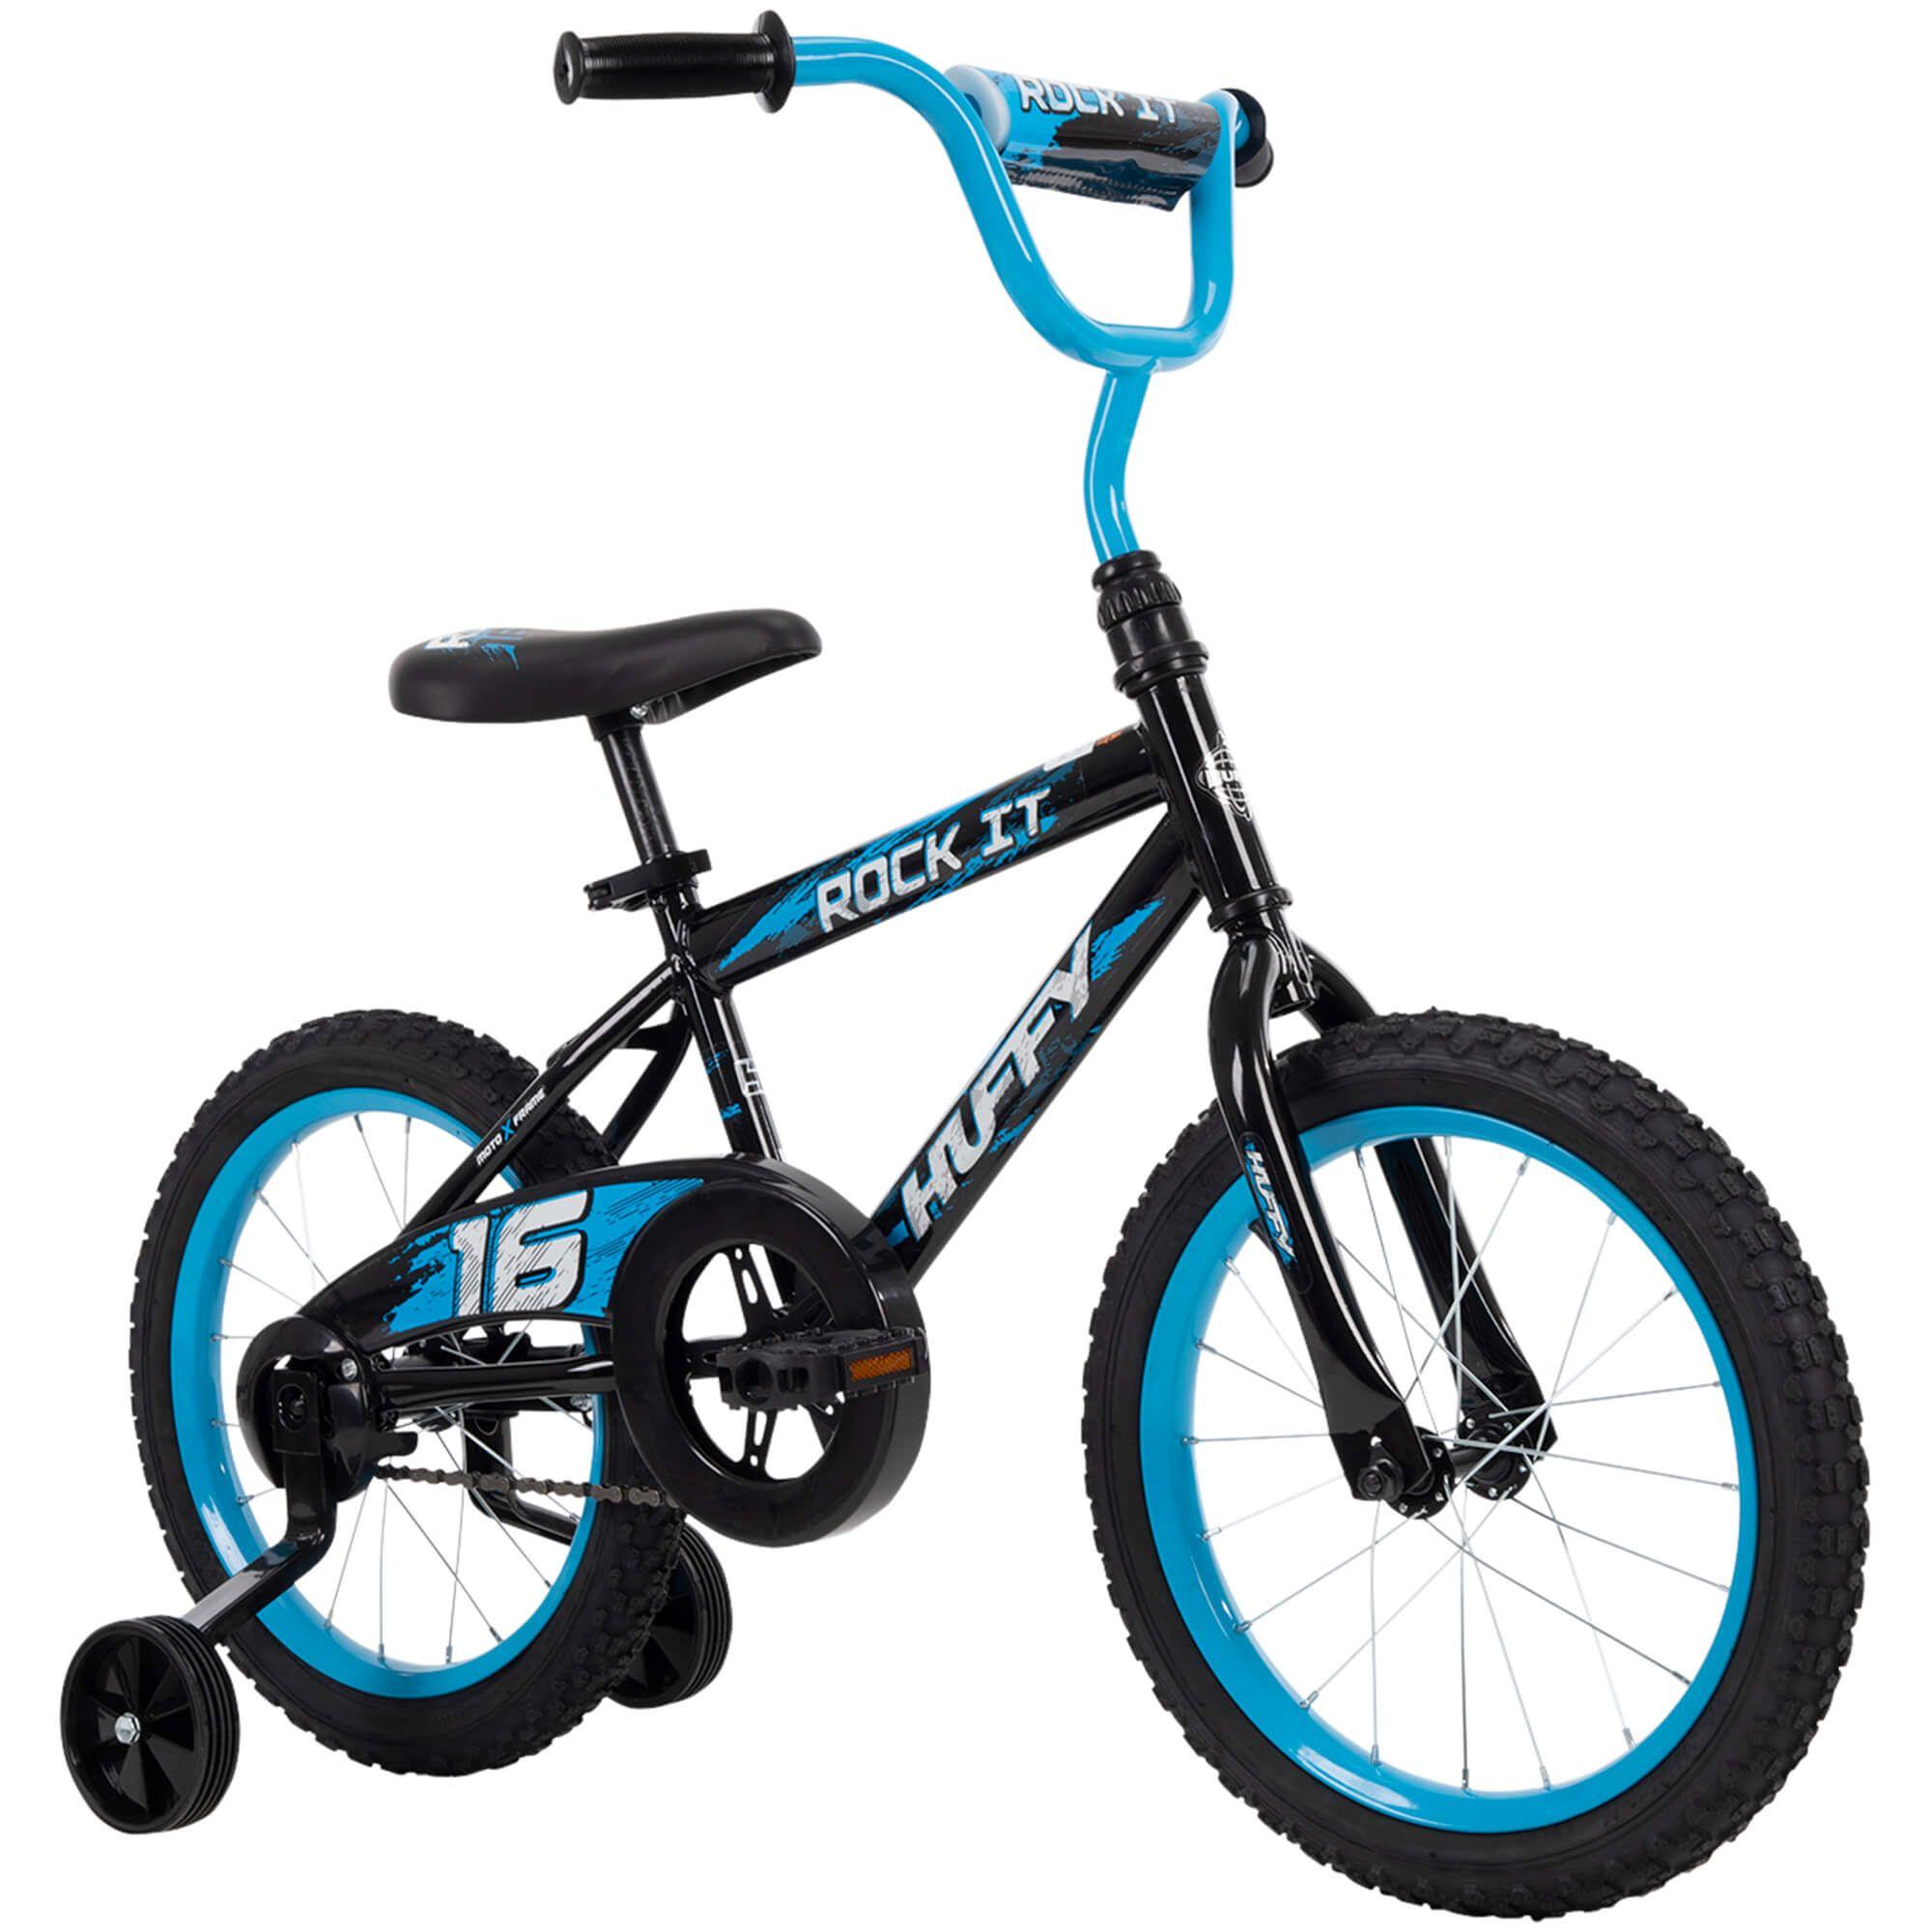 Huffy 16 Rock It Boys Bike For Kids Blue Walmart Com Boy Bike Kids Bike Huffy